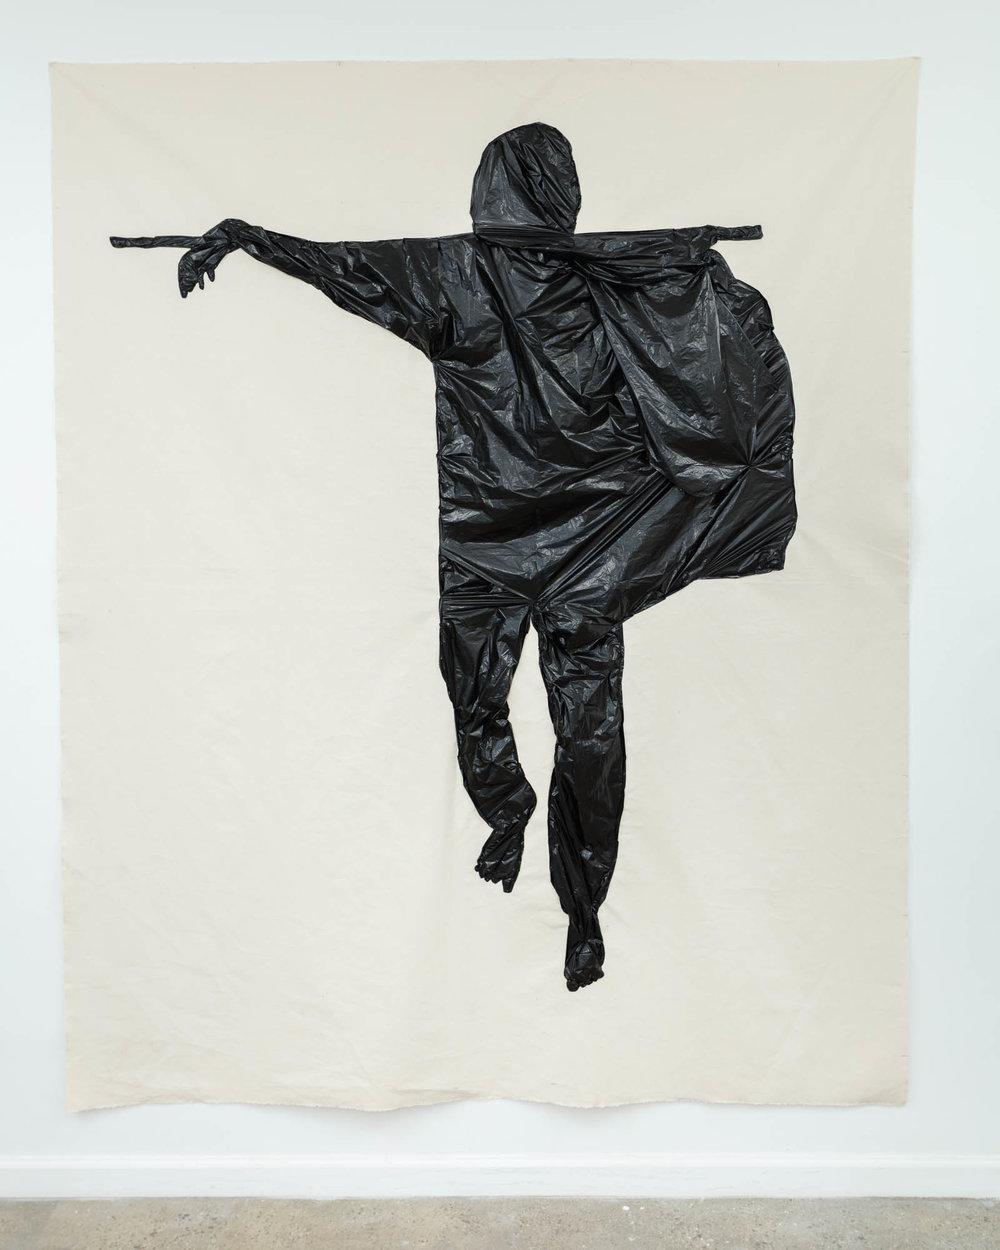 Fanny Allié, Man-Bare Feet, 2018